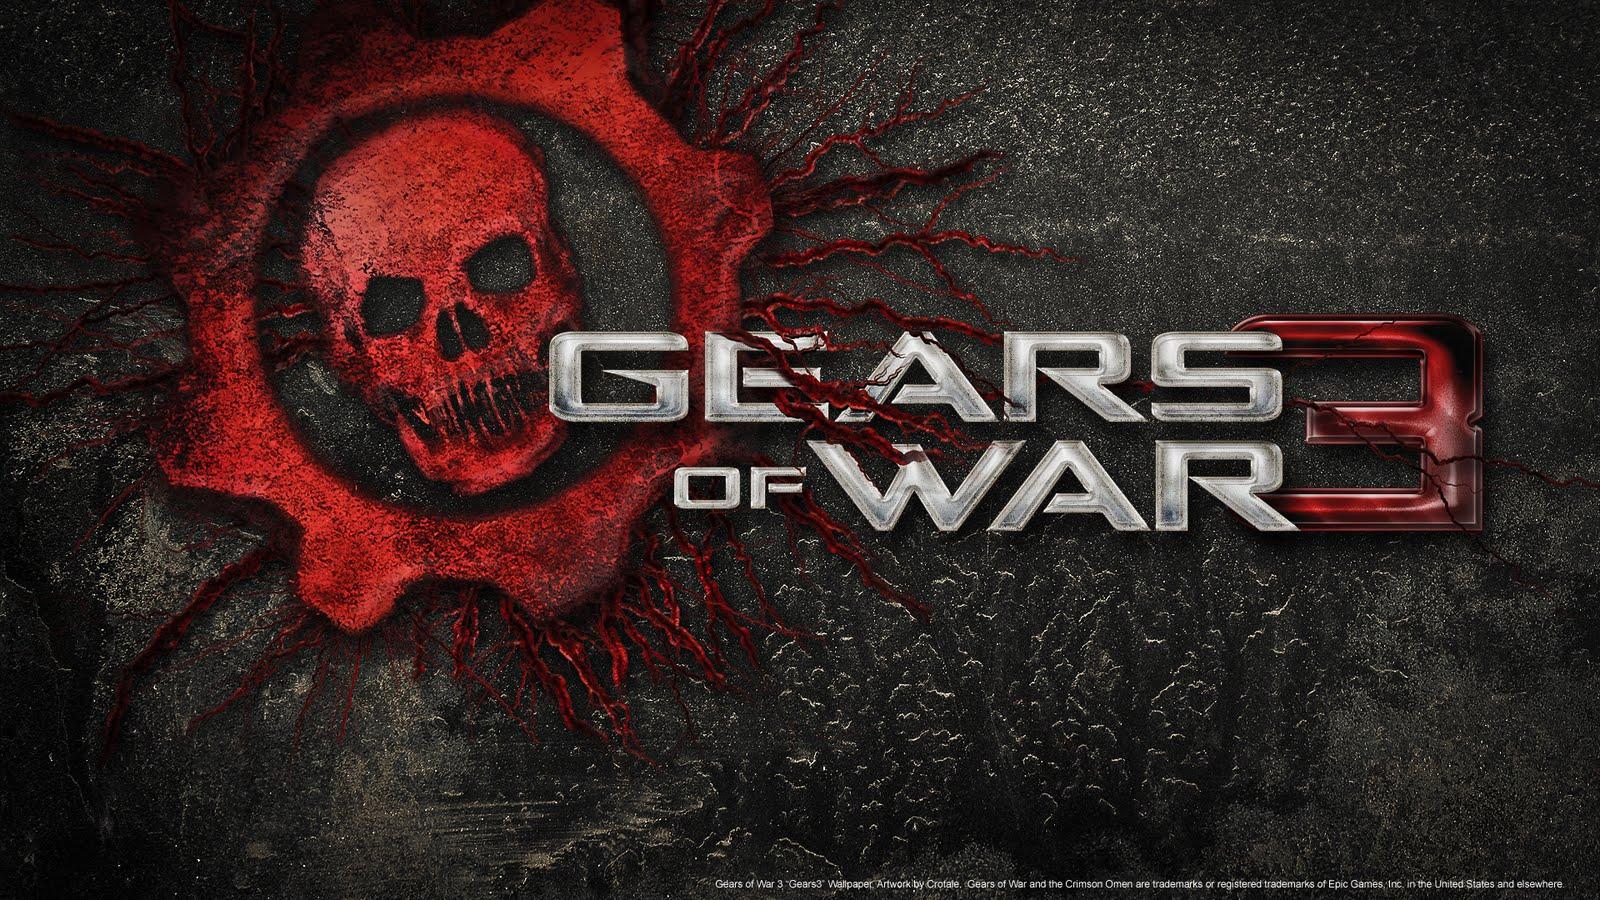 http://1.bp.blogspot.com/-jRlHE_cGpww/TlvgtCgDBpI/AAAAAAAADBw/8q0Se_kHNnk/s1600/Gears+of+war+3+wallpapers+%25284%2529.jpg